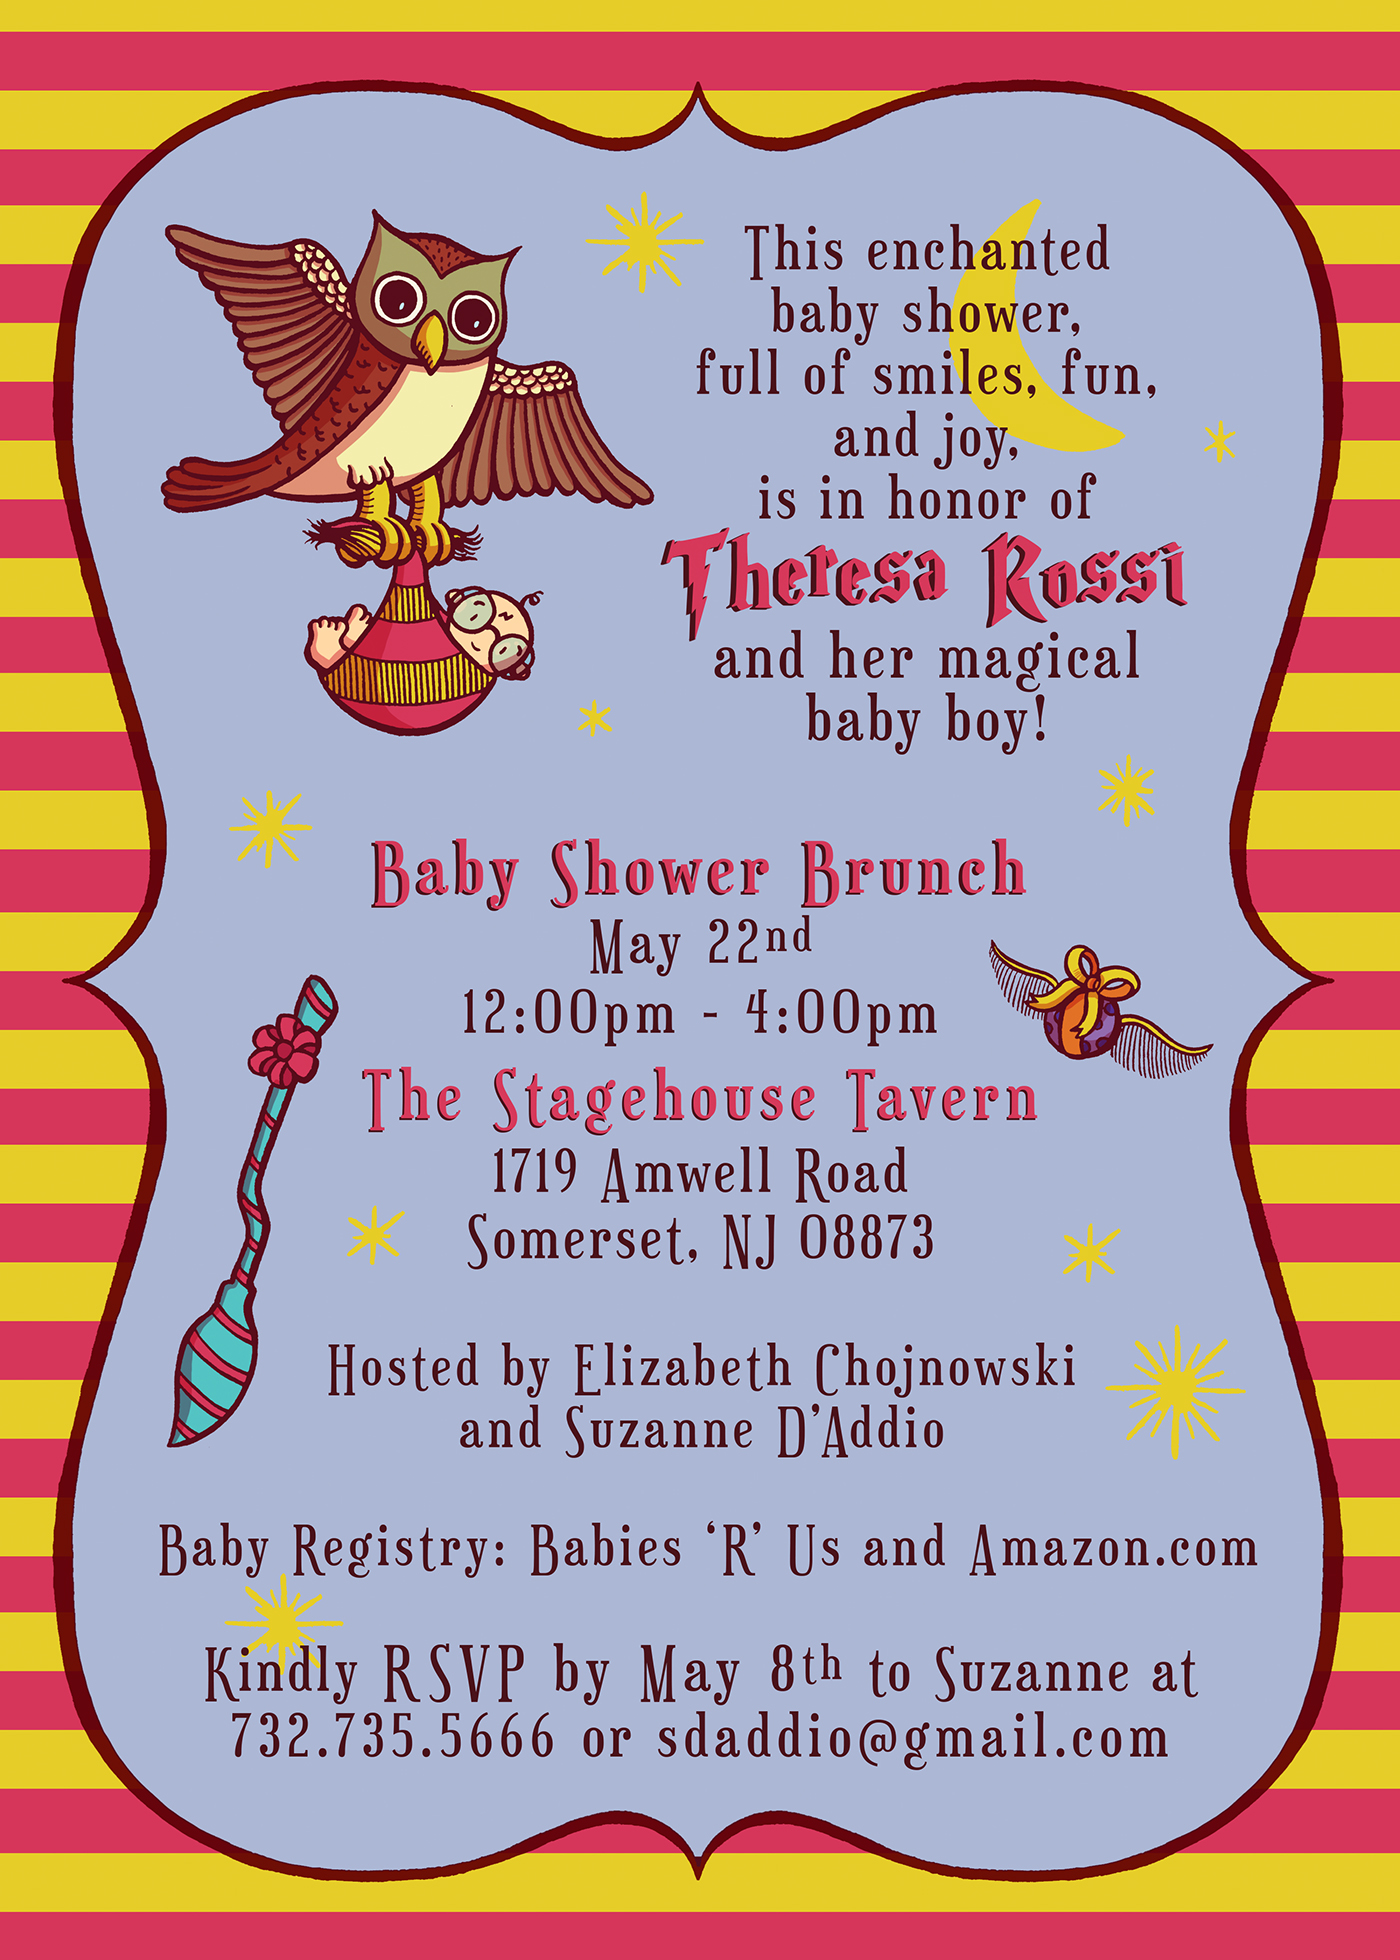 Harry Potter baby shower invitation on Behance